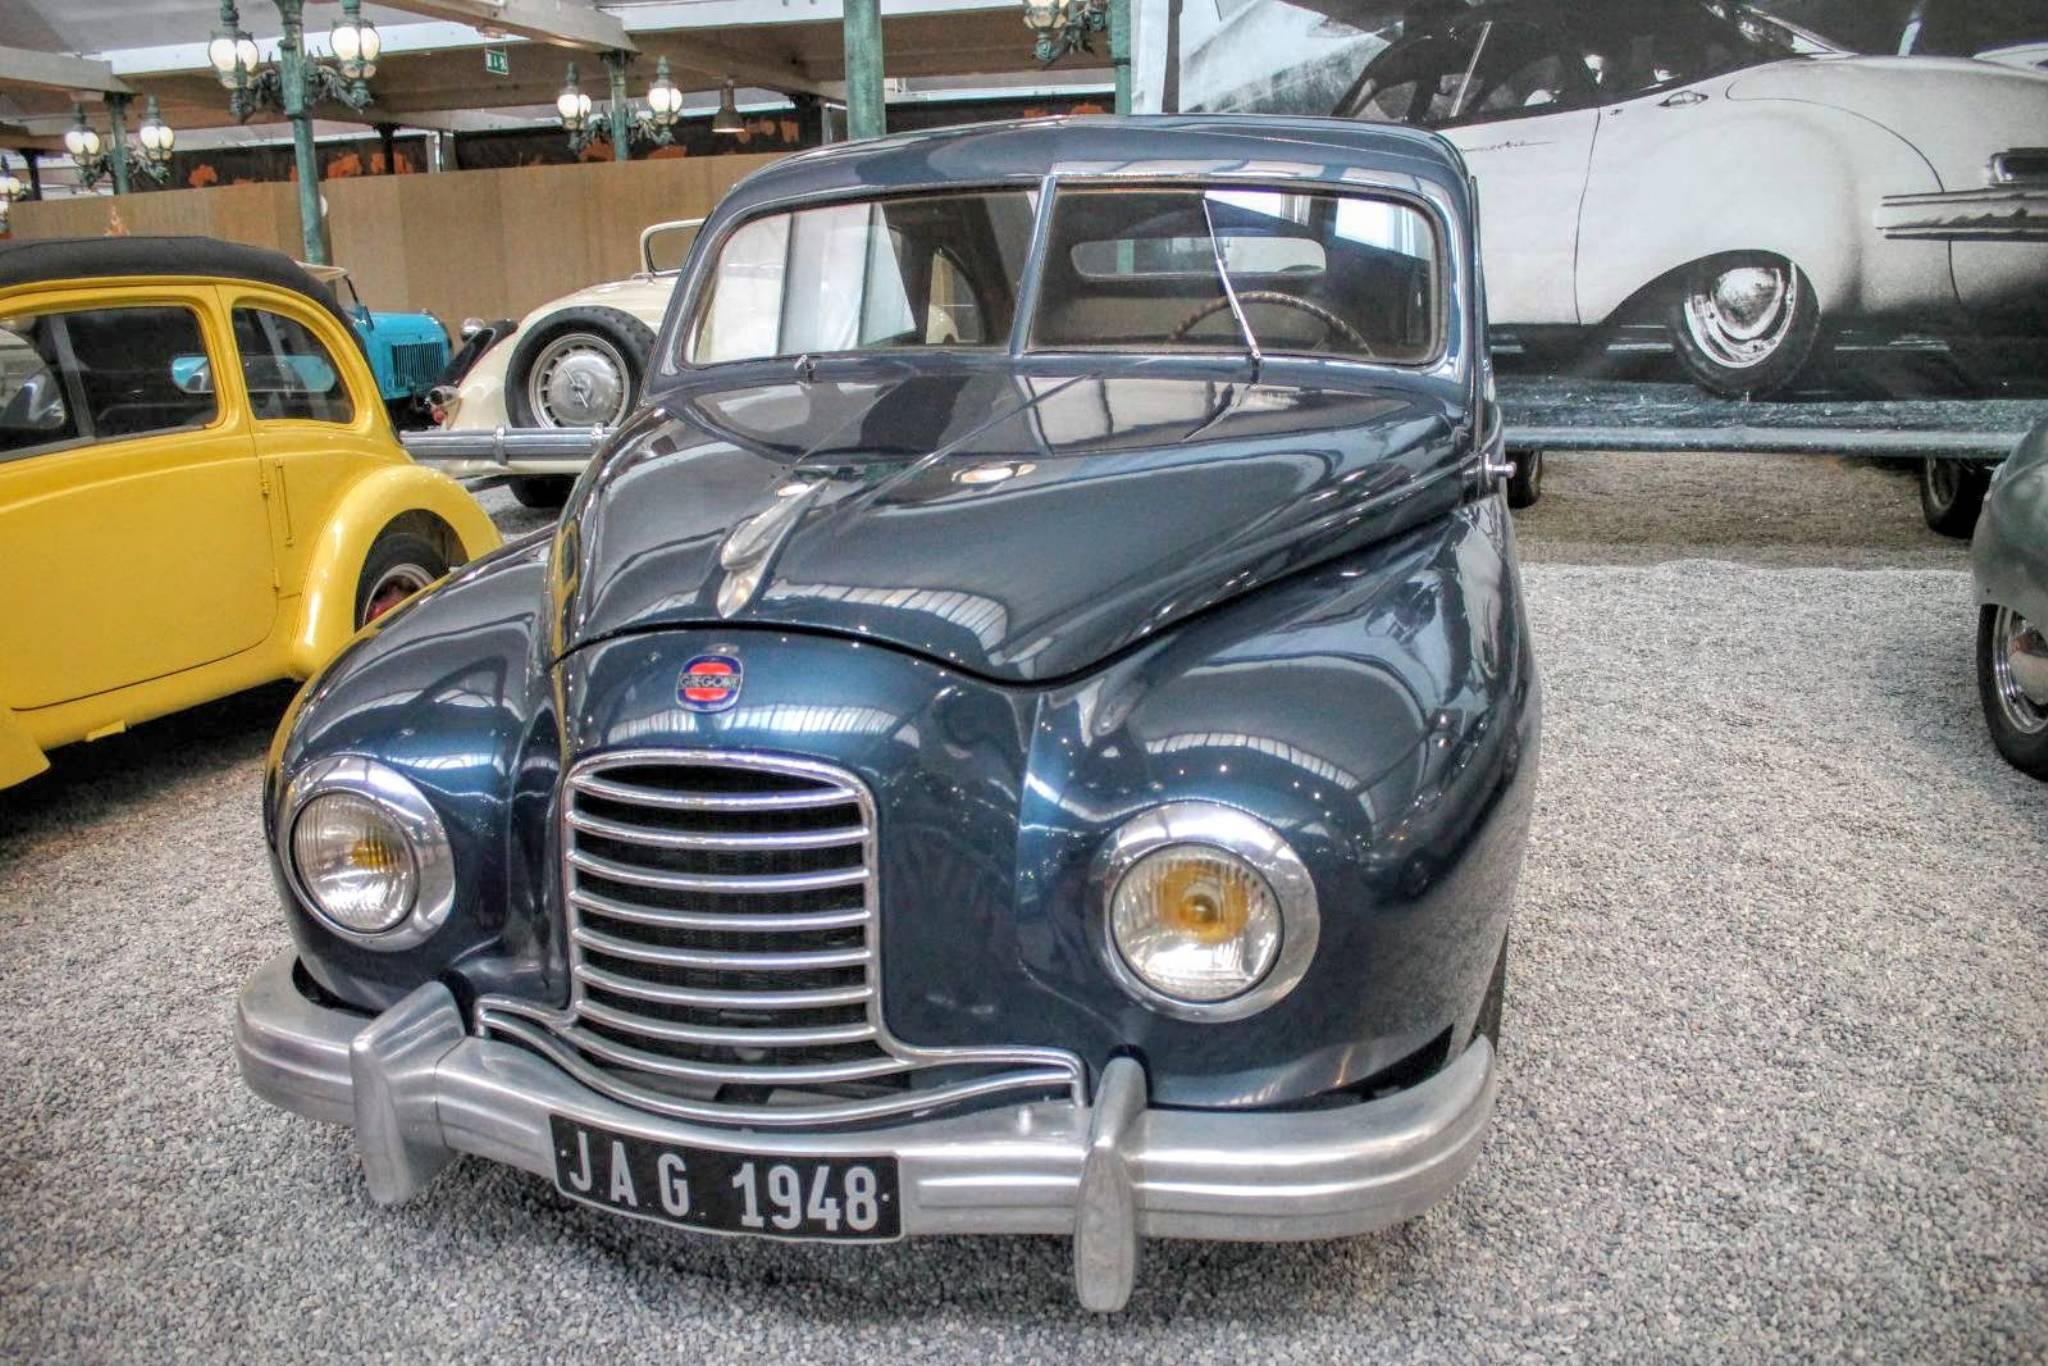 1953 Hotchkiss Gregoire Berline Jag